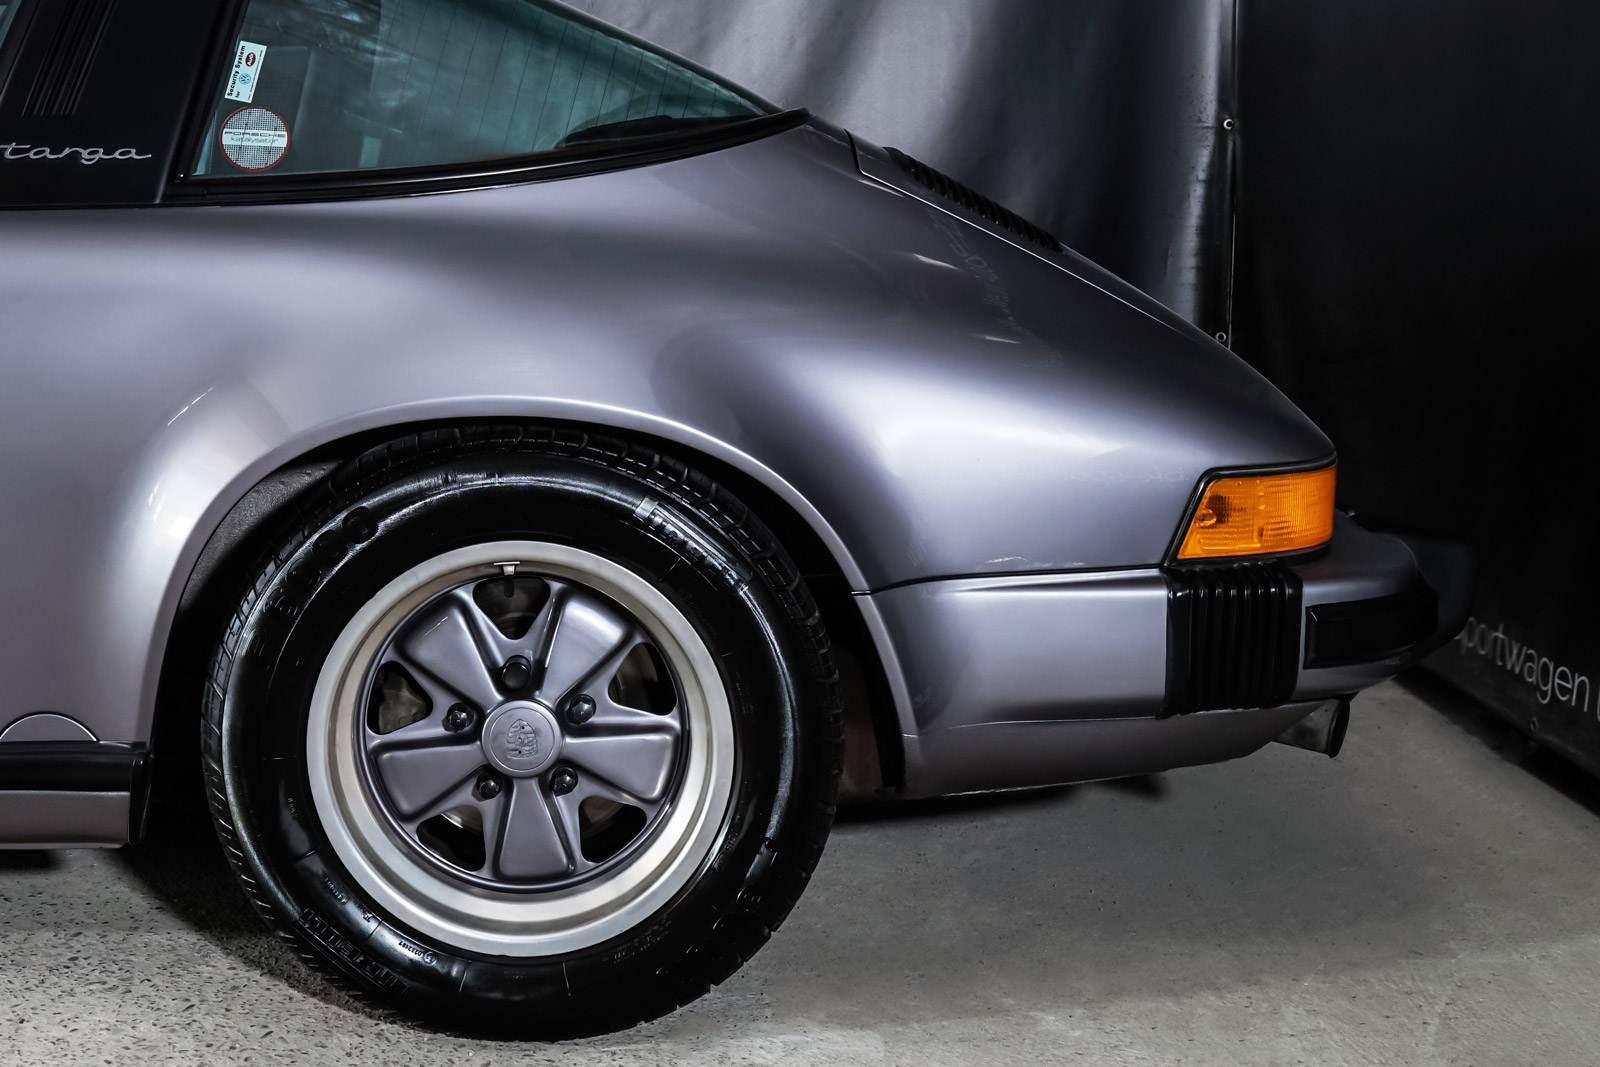 Porsche_911_Targa_Diamantblaumetallic_Blau_POR-0092_4_w